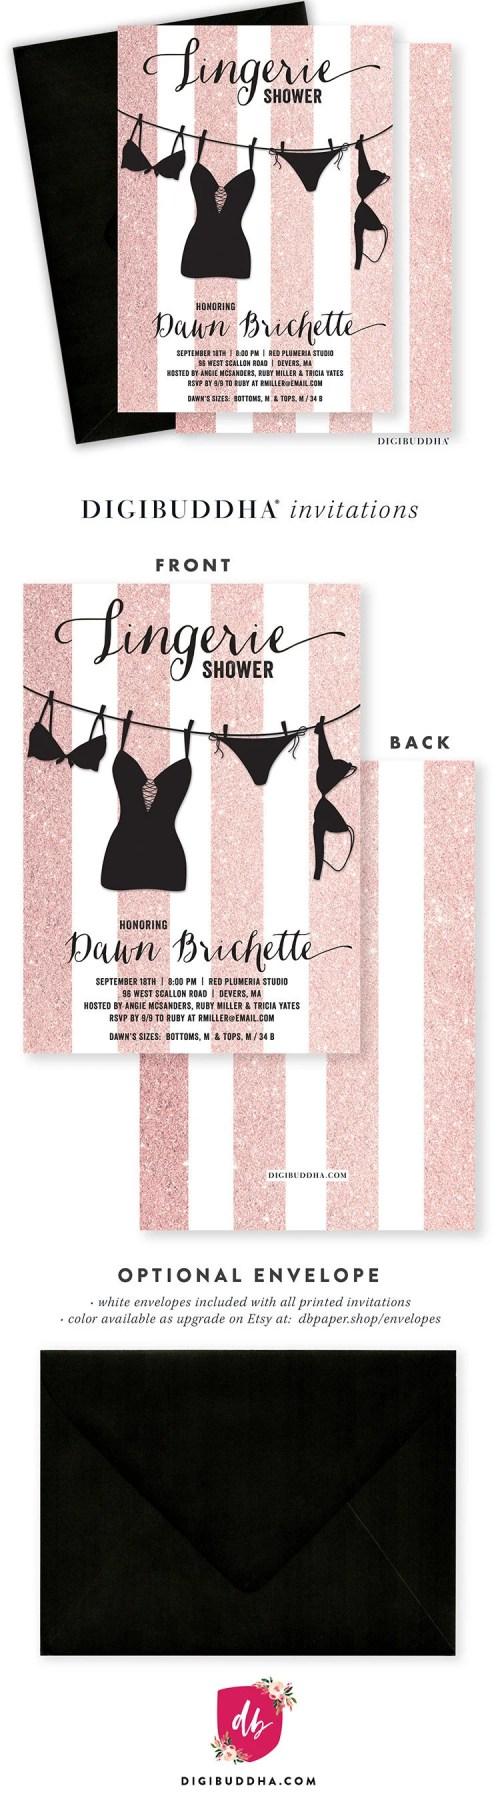 Unusual Lingerie Shower Invitation Lingerie Shower Invite Blush Shower Lingerie Shower Invitation Template